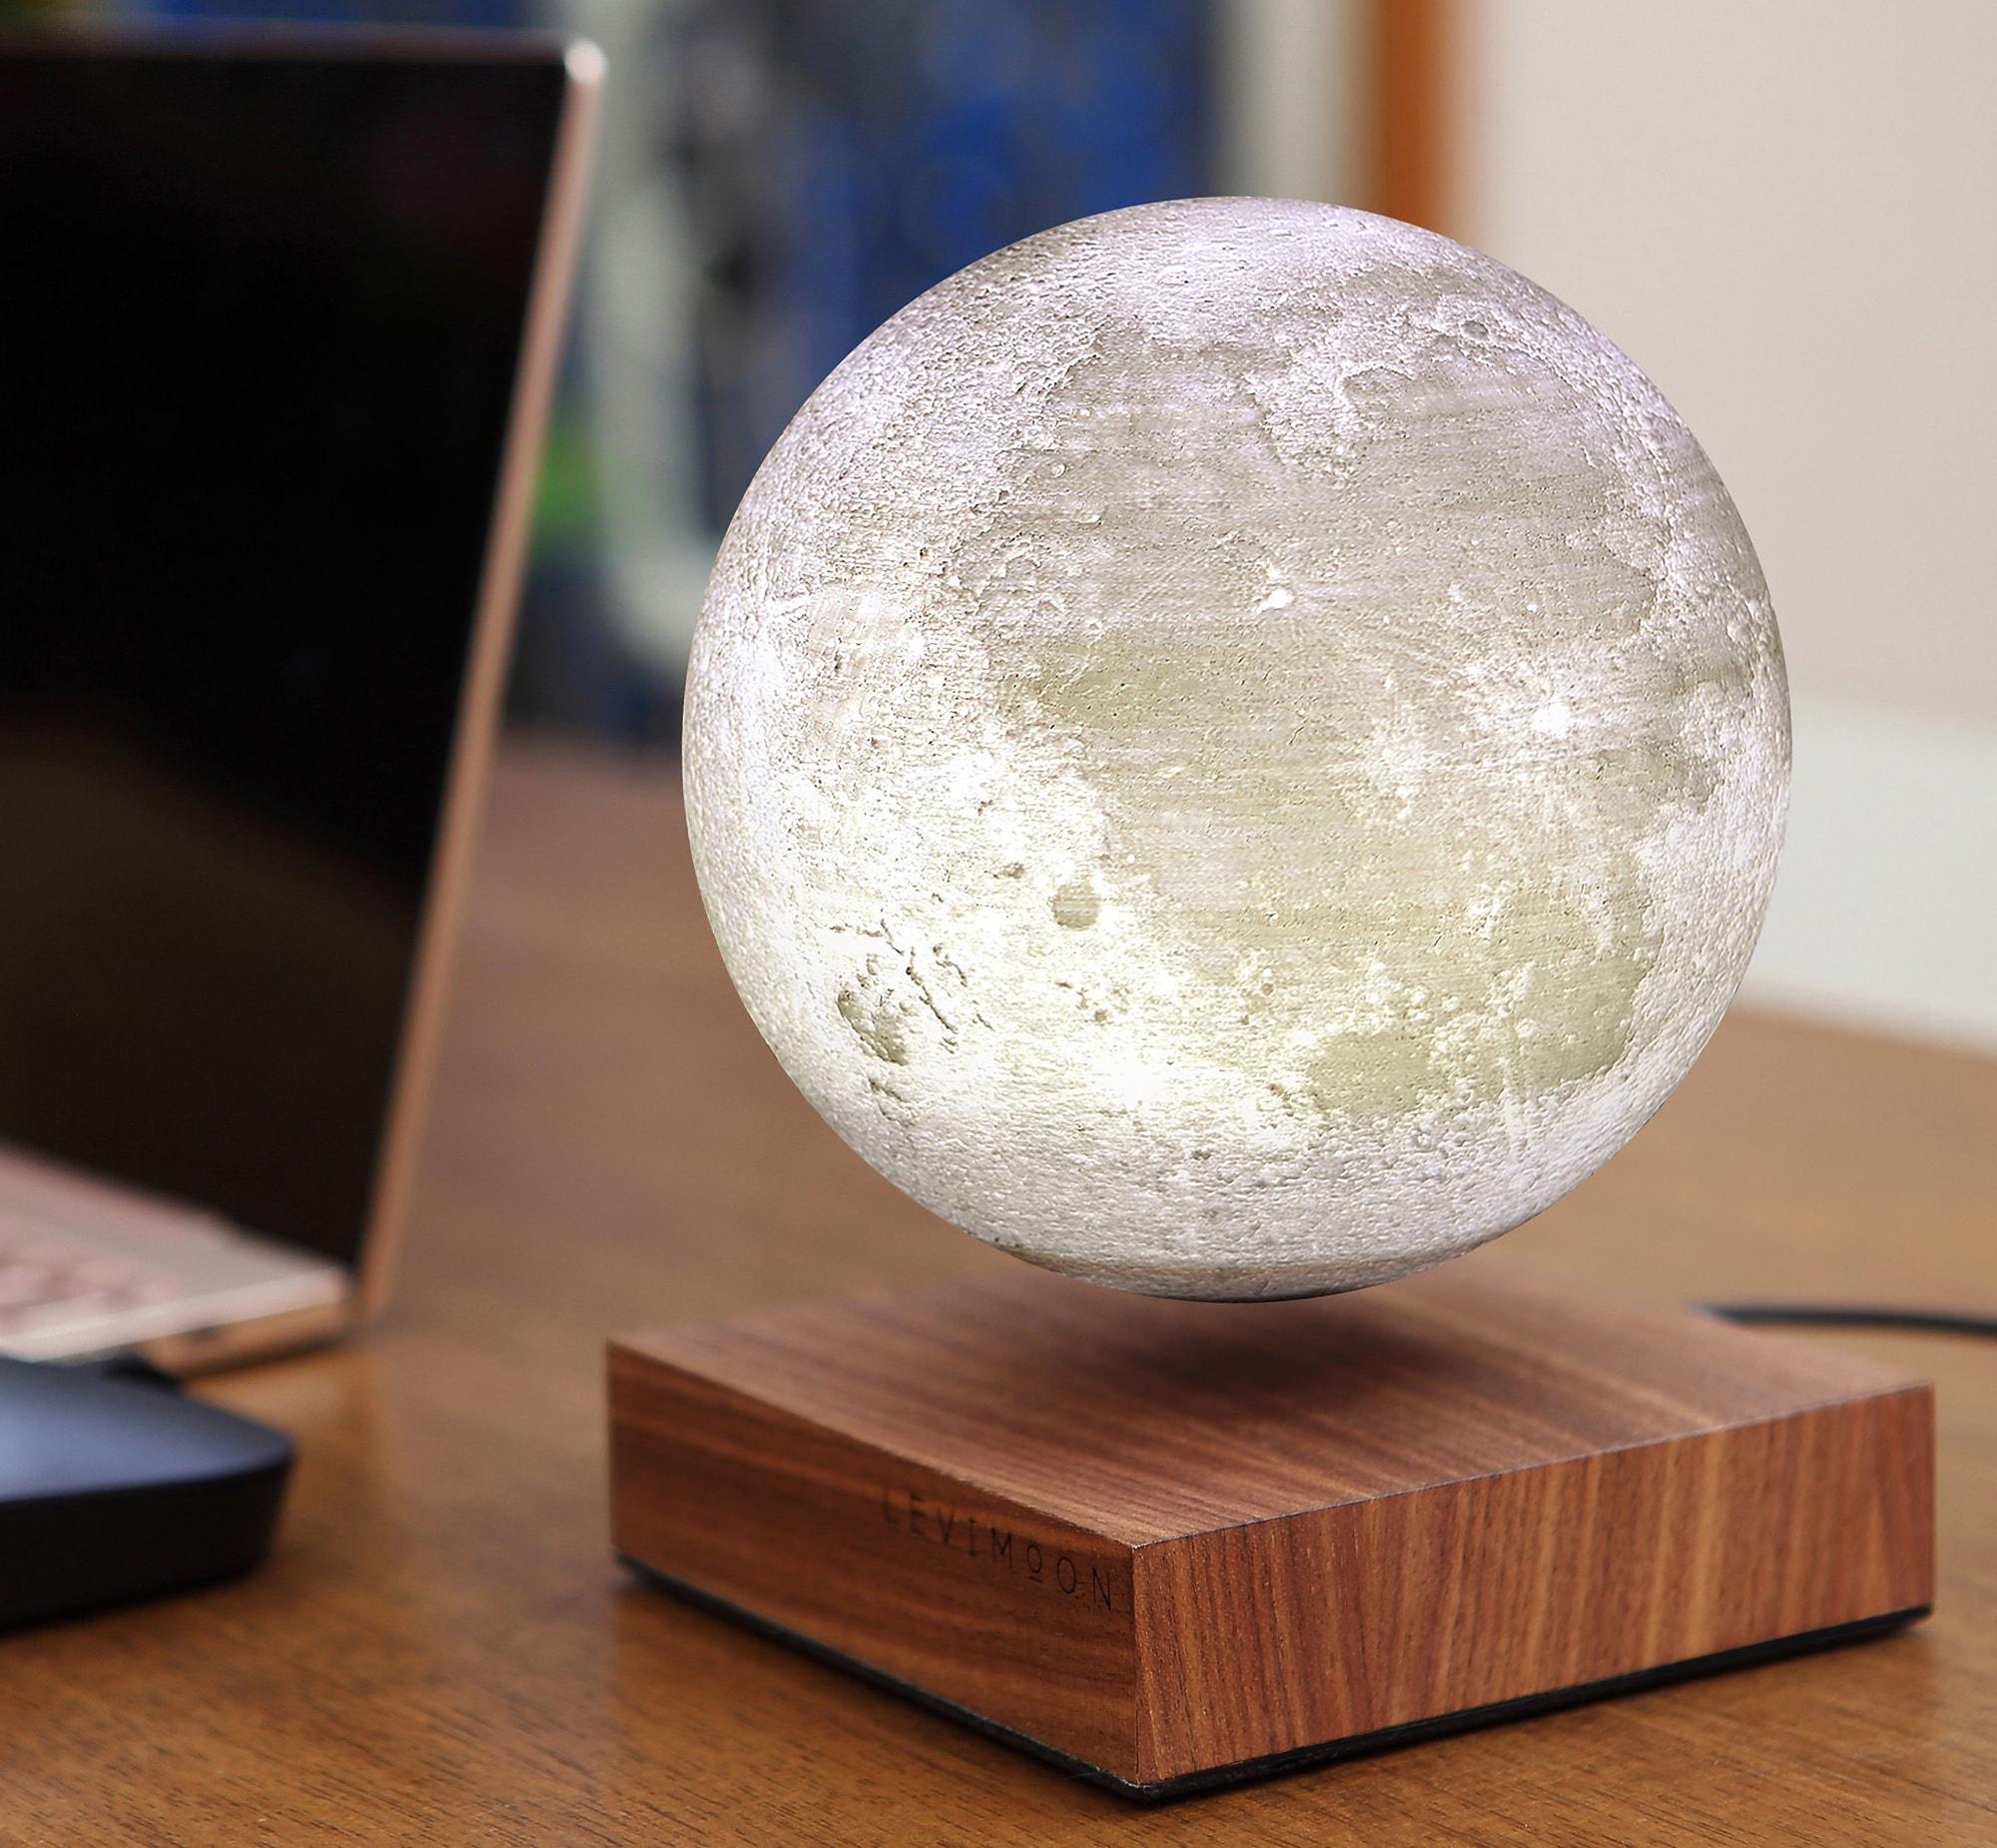 levitating moon light levimoon coocepts